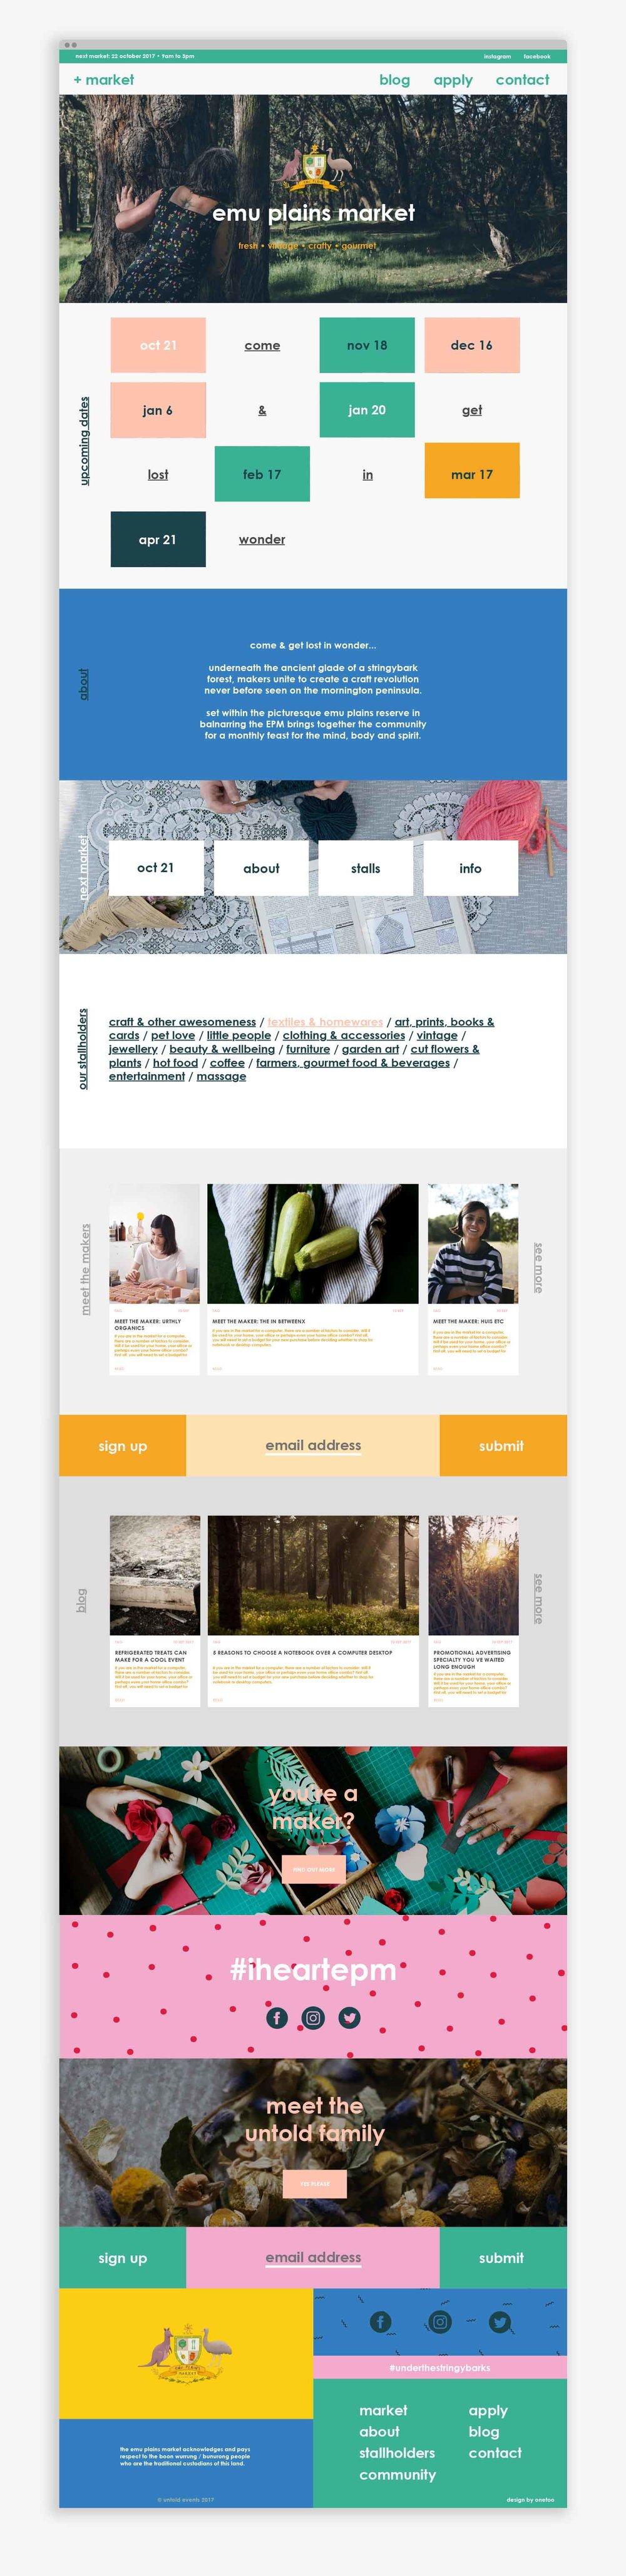 Emu Plains Market Web Design.jpg